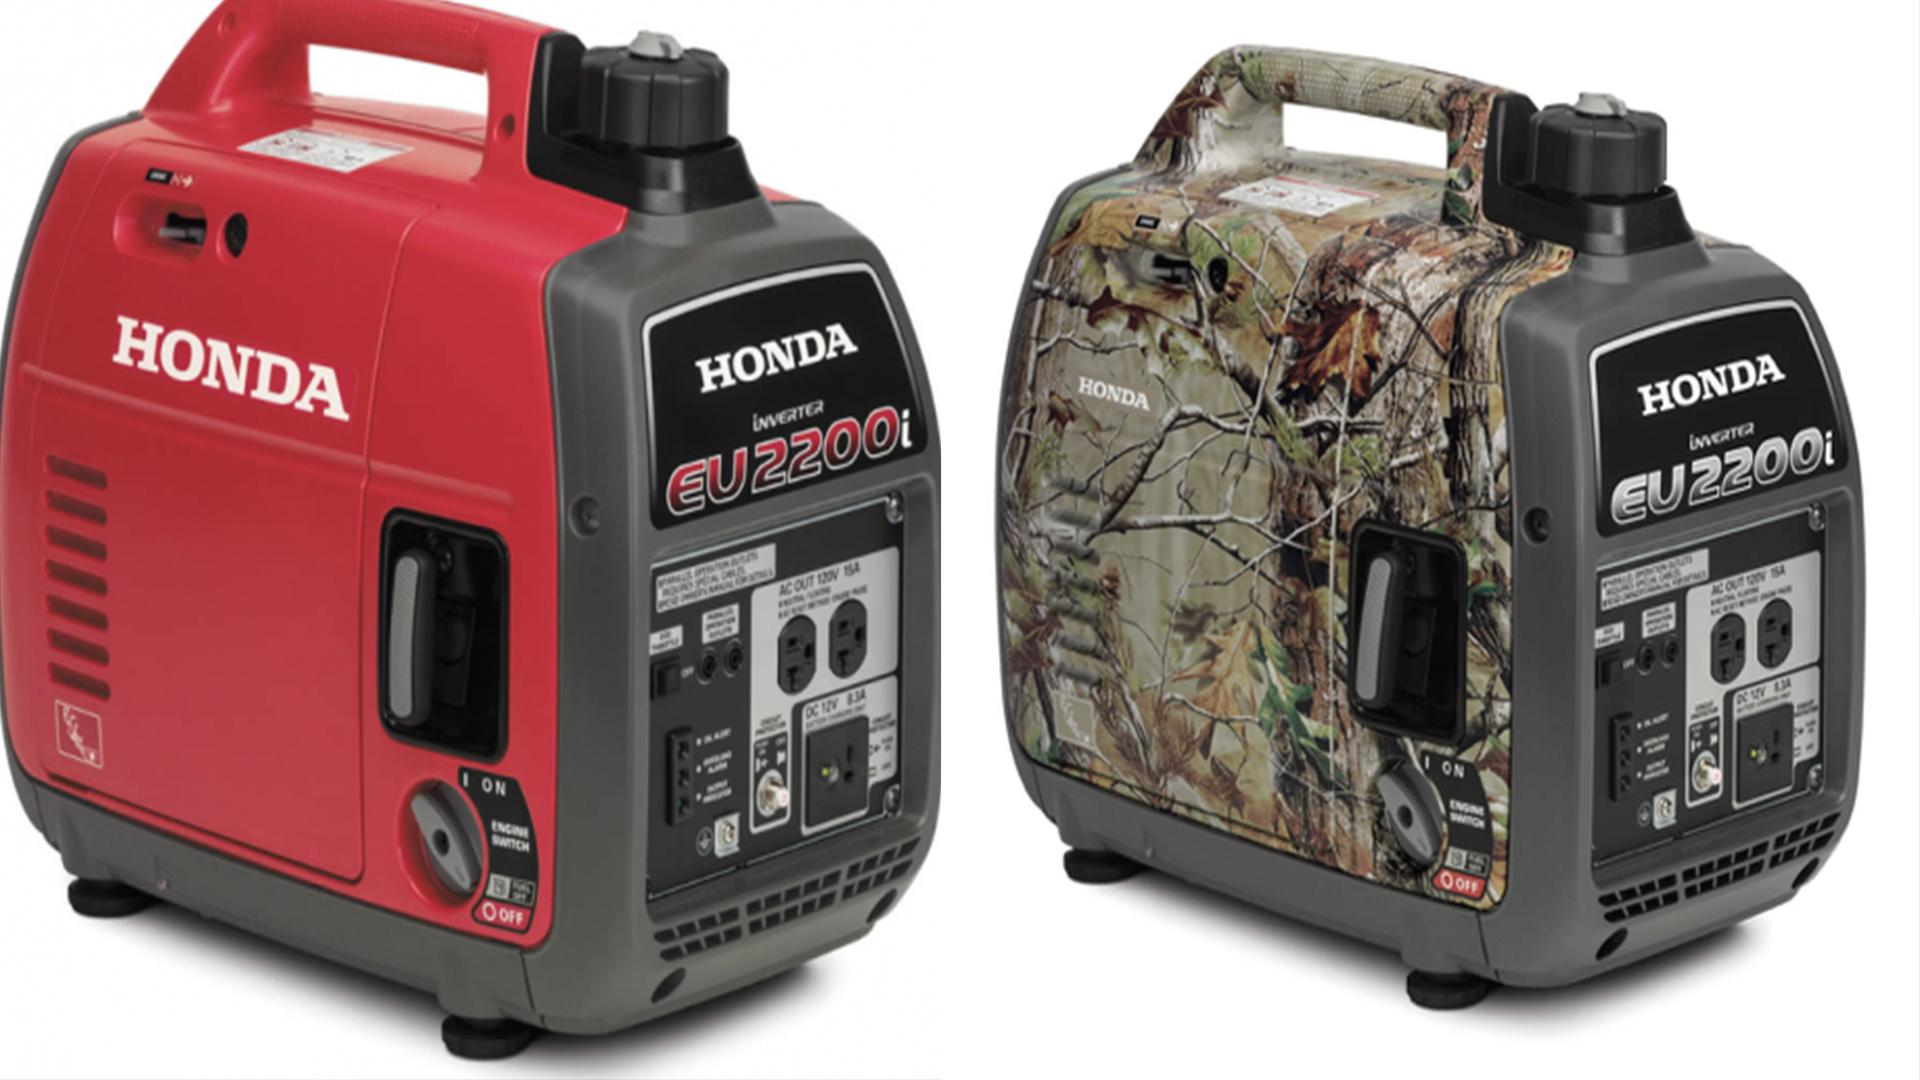 Honda recalls 200K generators due to potential gas leak